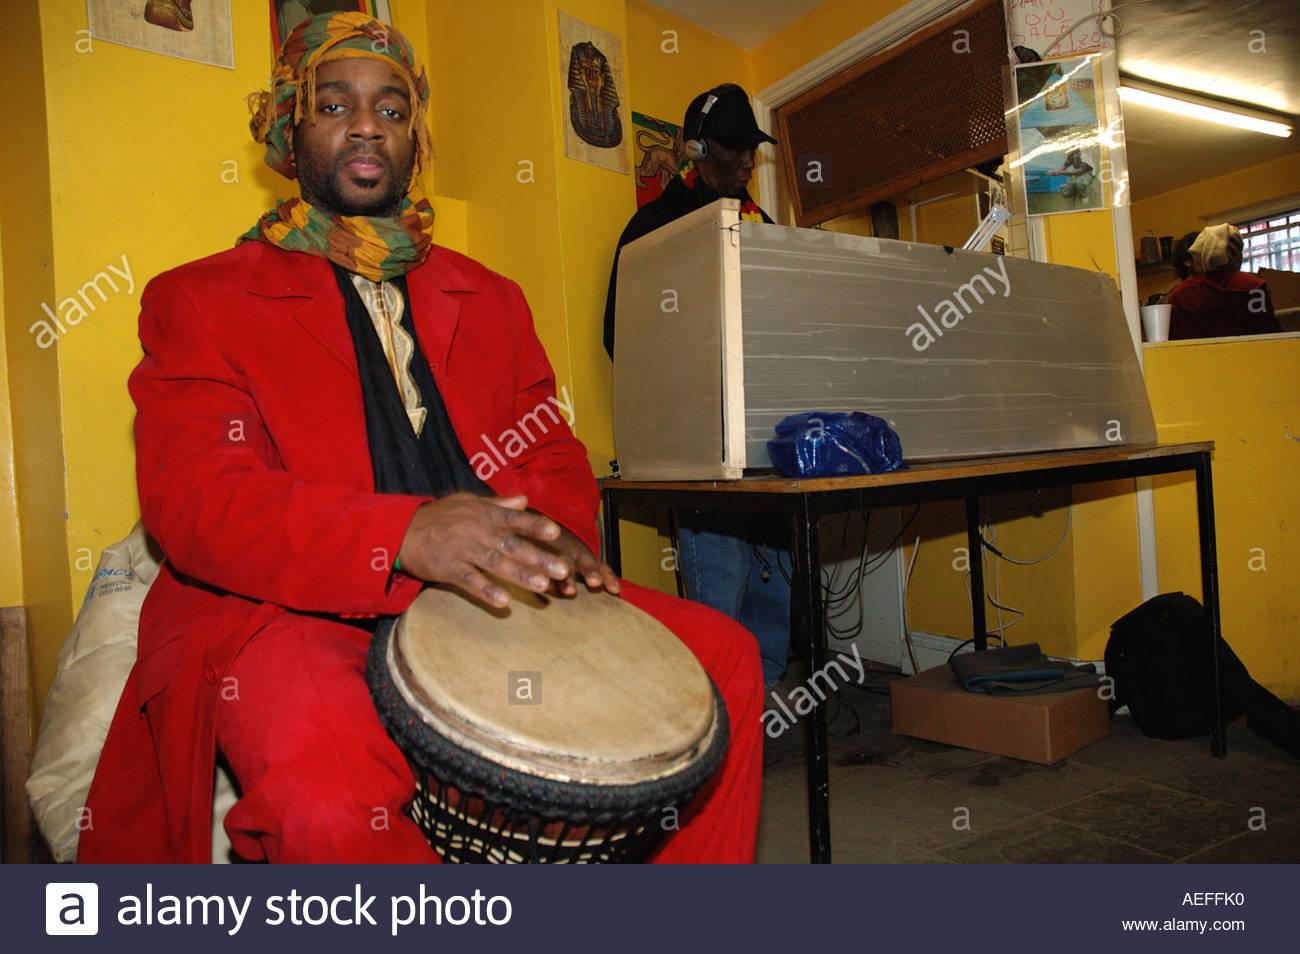 Rastafarian Man In West London Stock Photos & Rastafarian